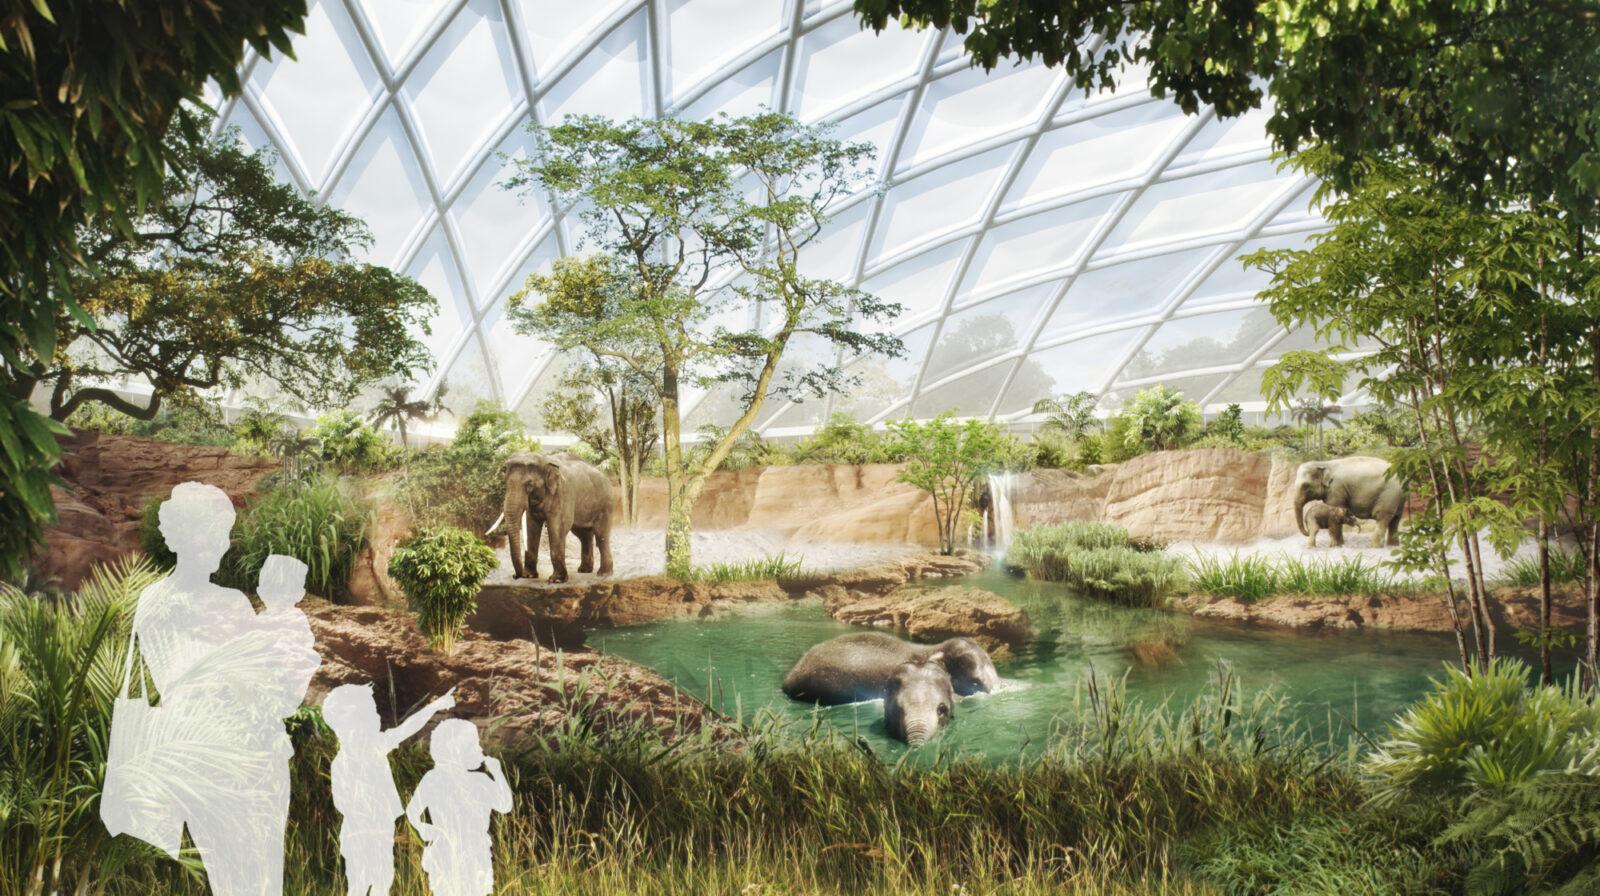 elefantenwelt wilhelma henchion reuter architekten. Black Bedroom Furniture Sets. Home Design Ideas